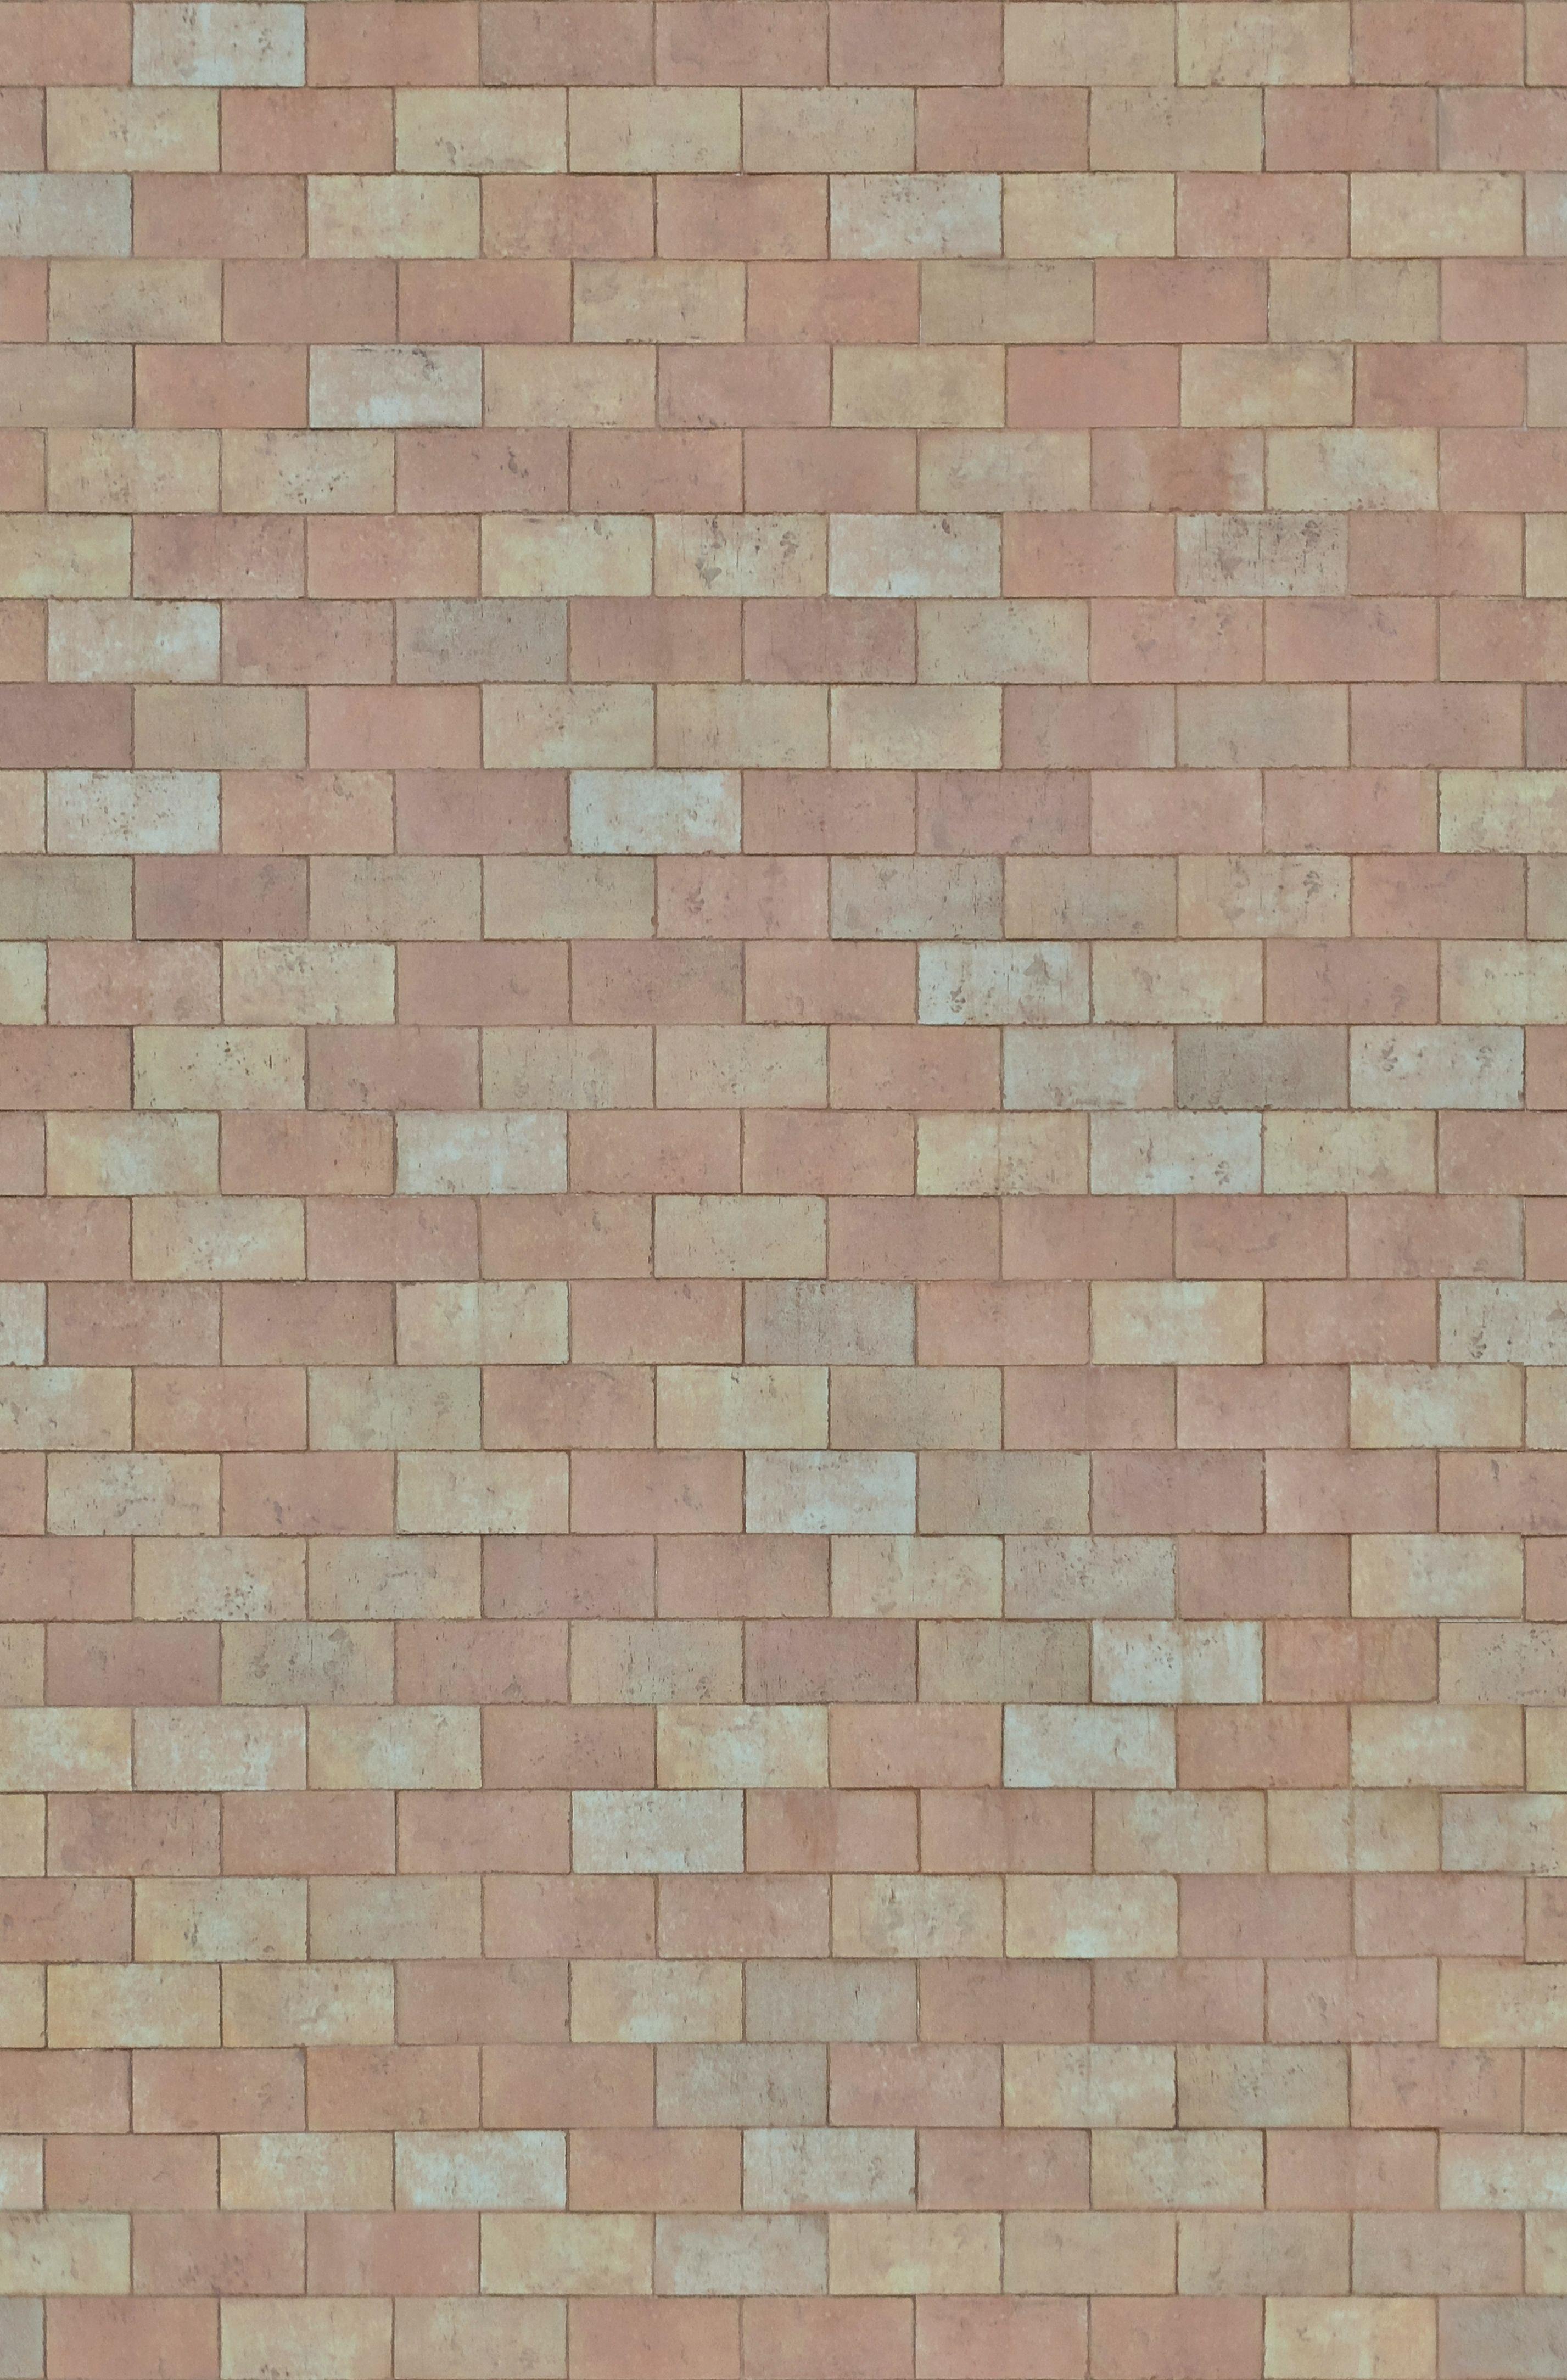 Tiles architextures materials textures. Brick clipart ceramic